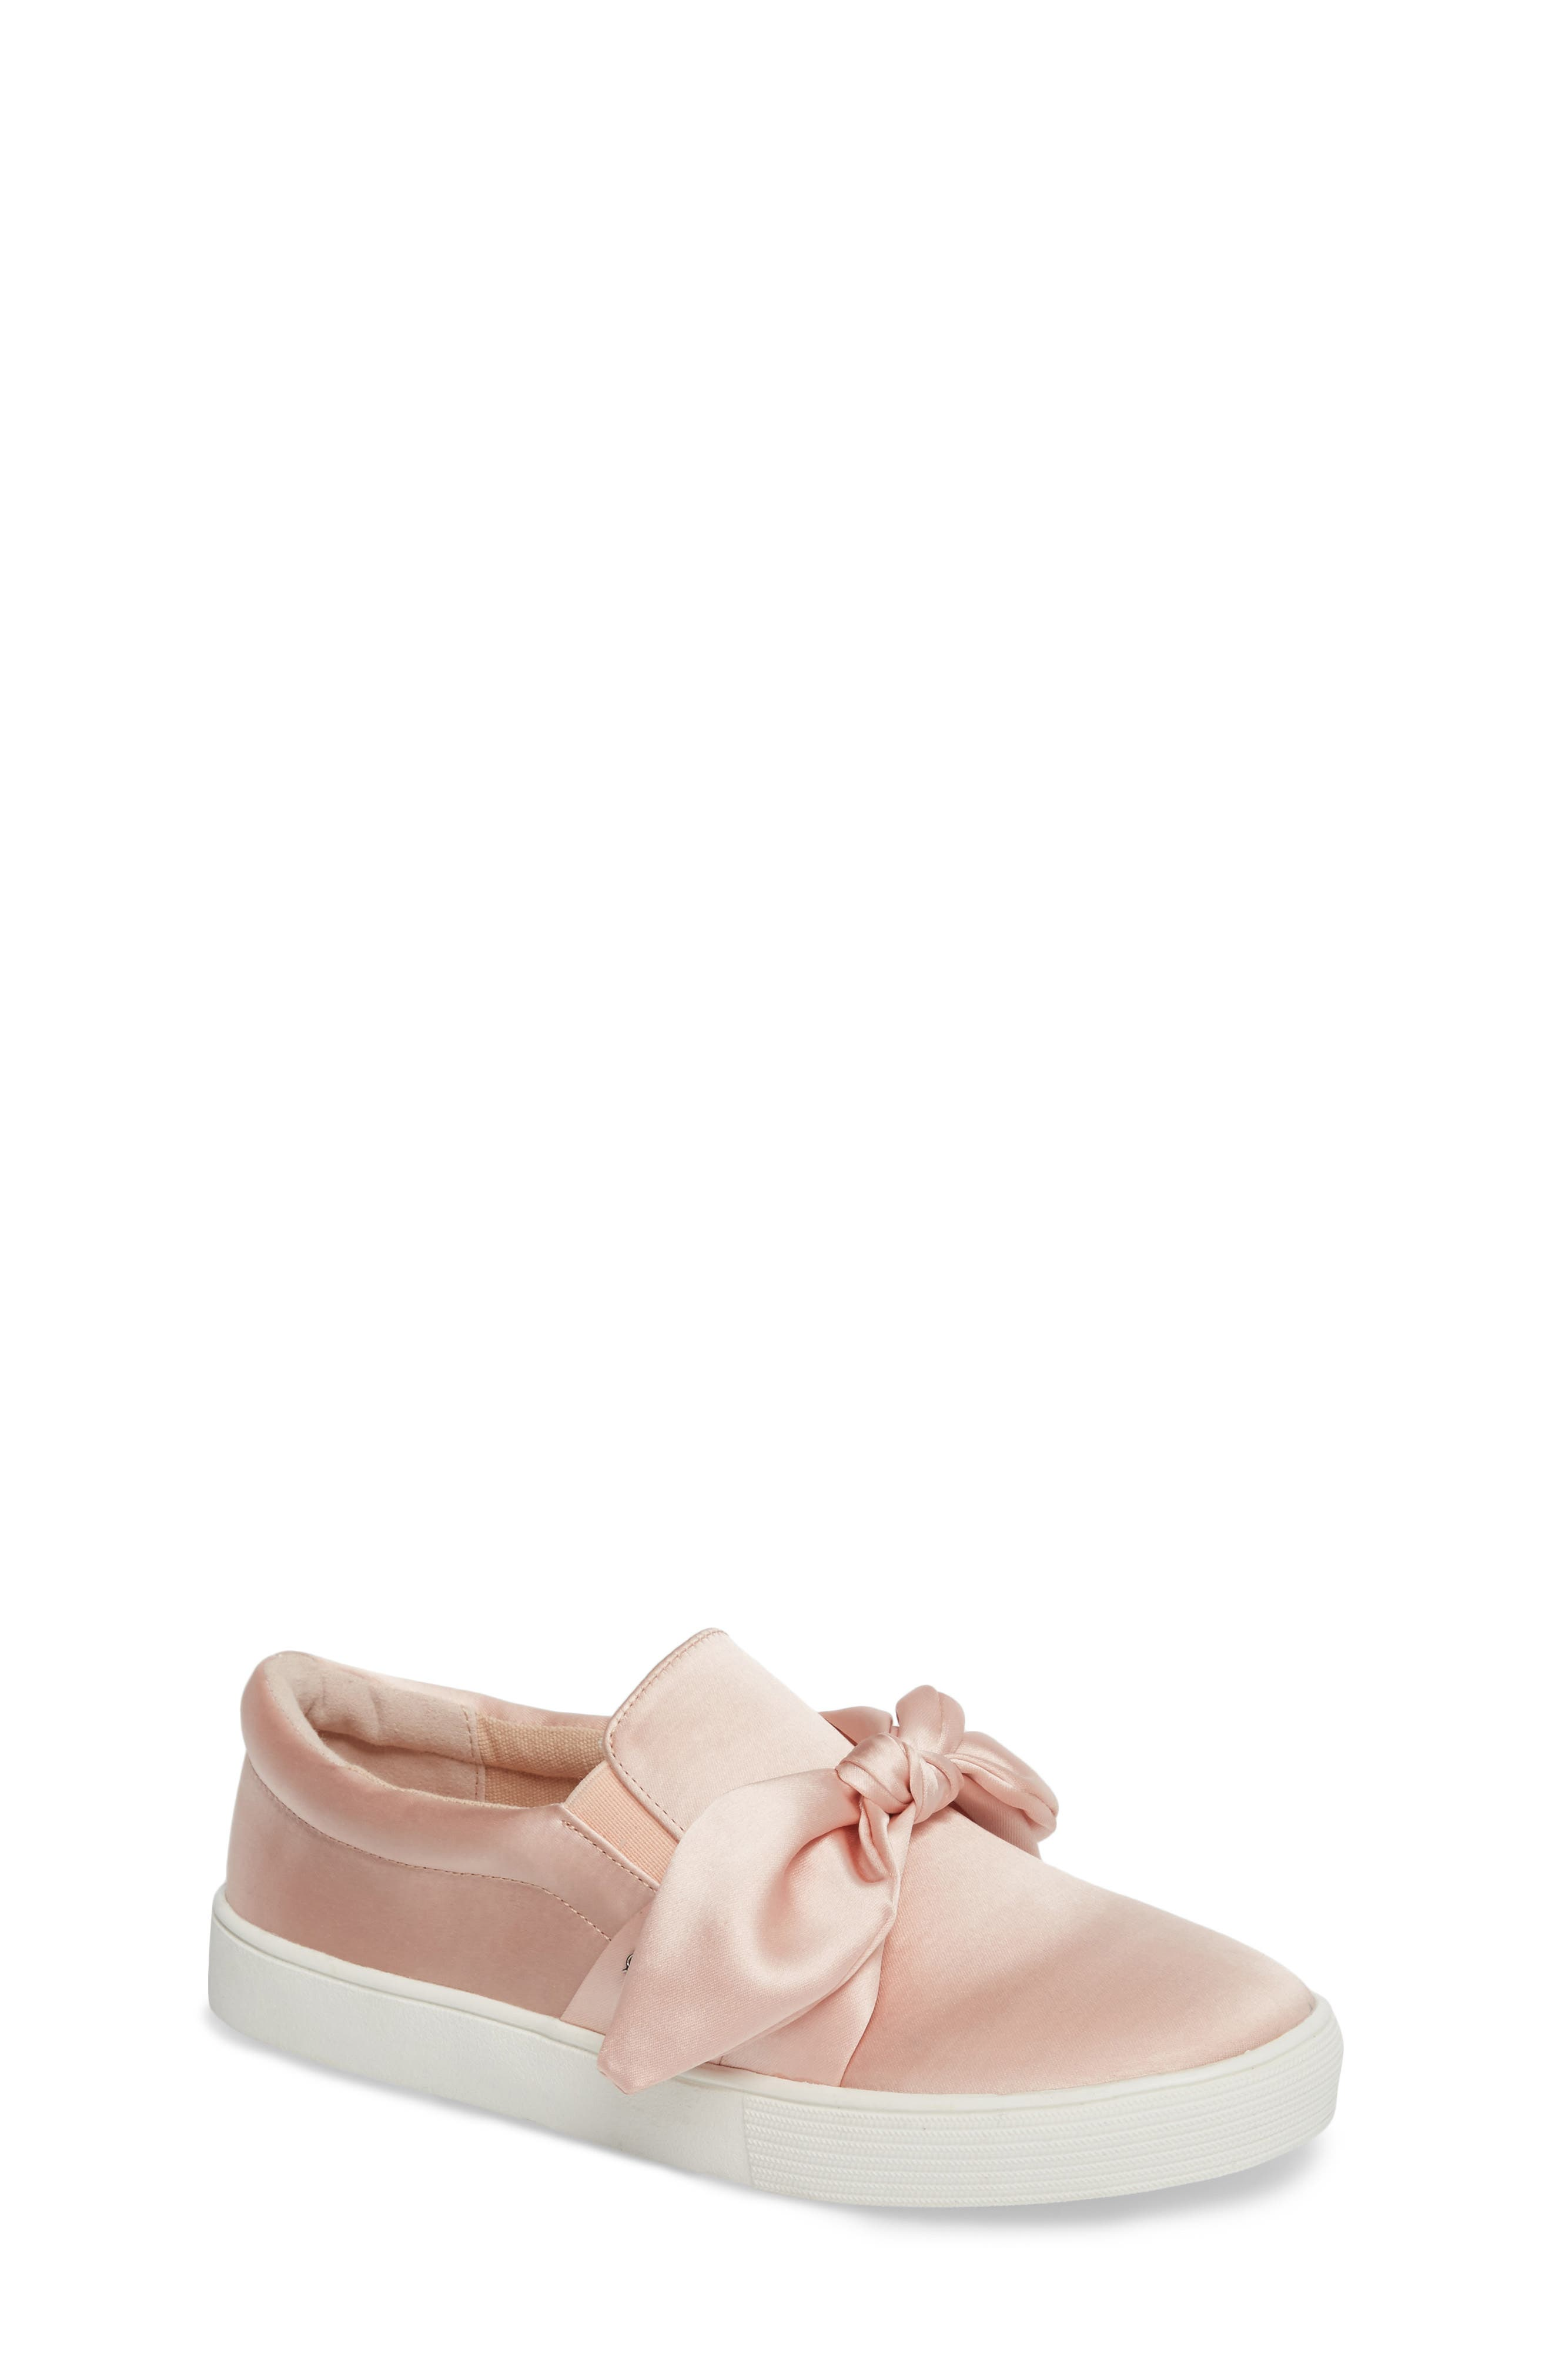 Bella Eden Slip-On Sneaker,                             Main thumbnail 1, color,                             Blush Satin